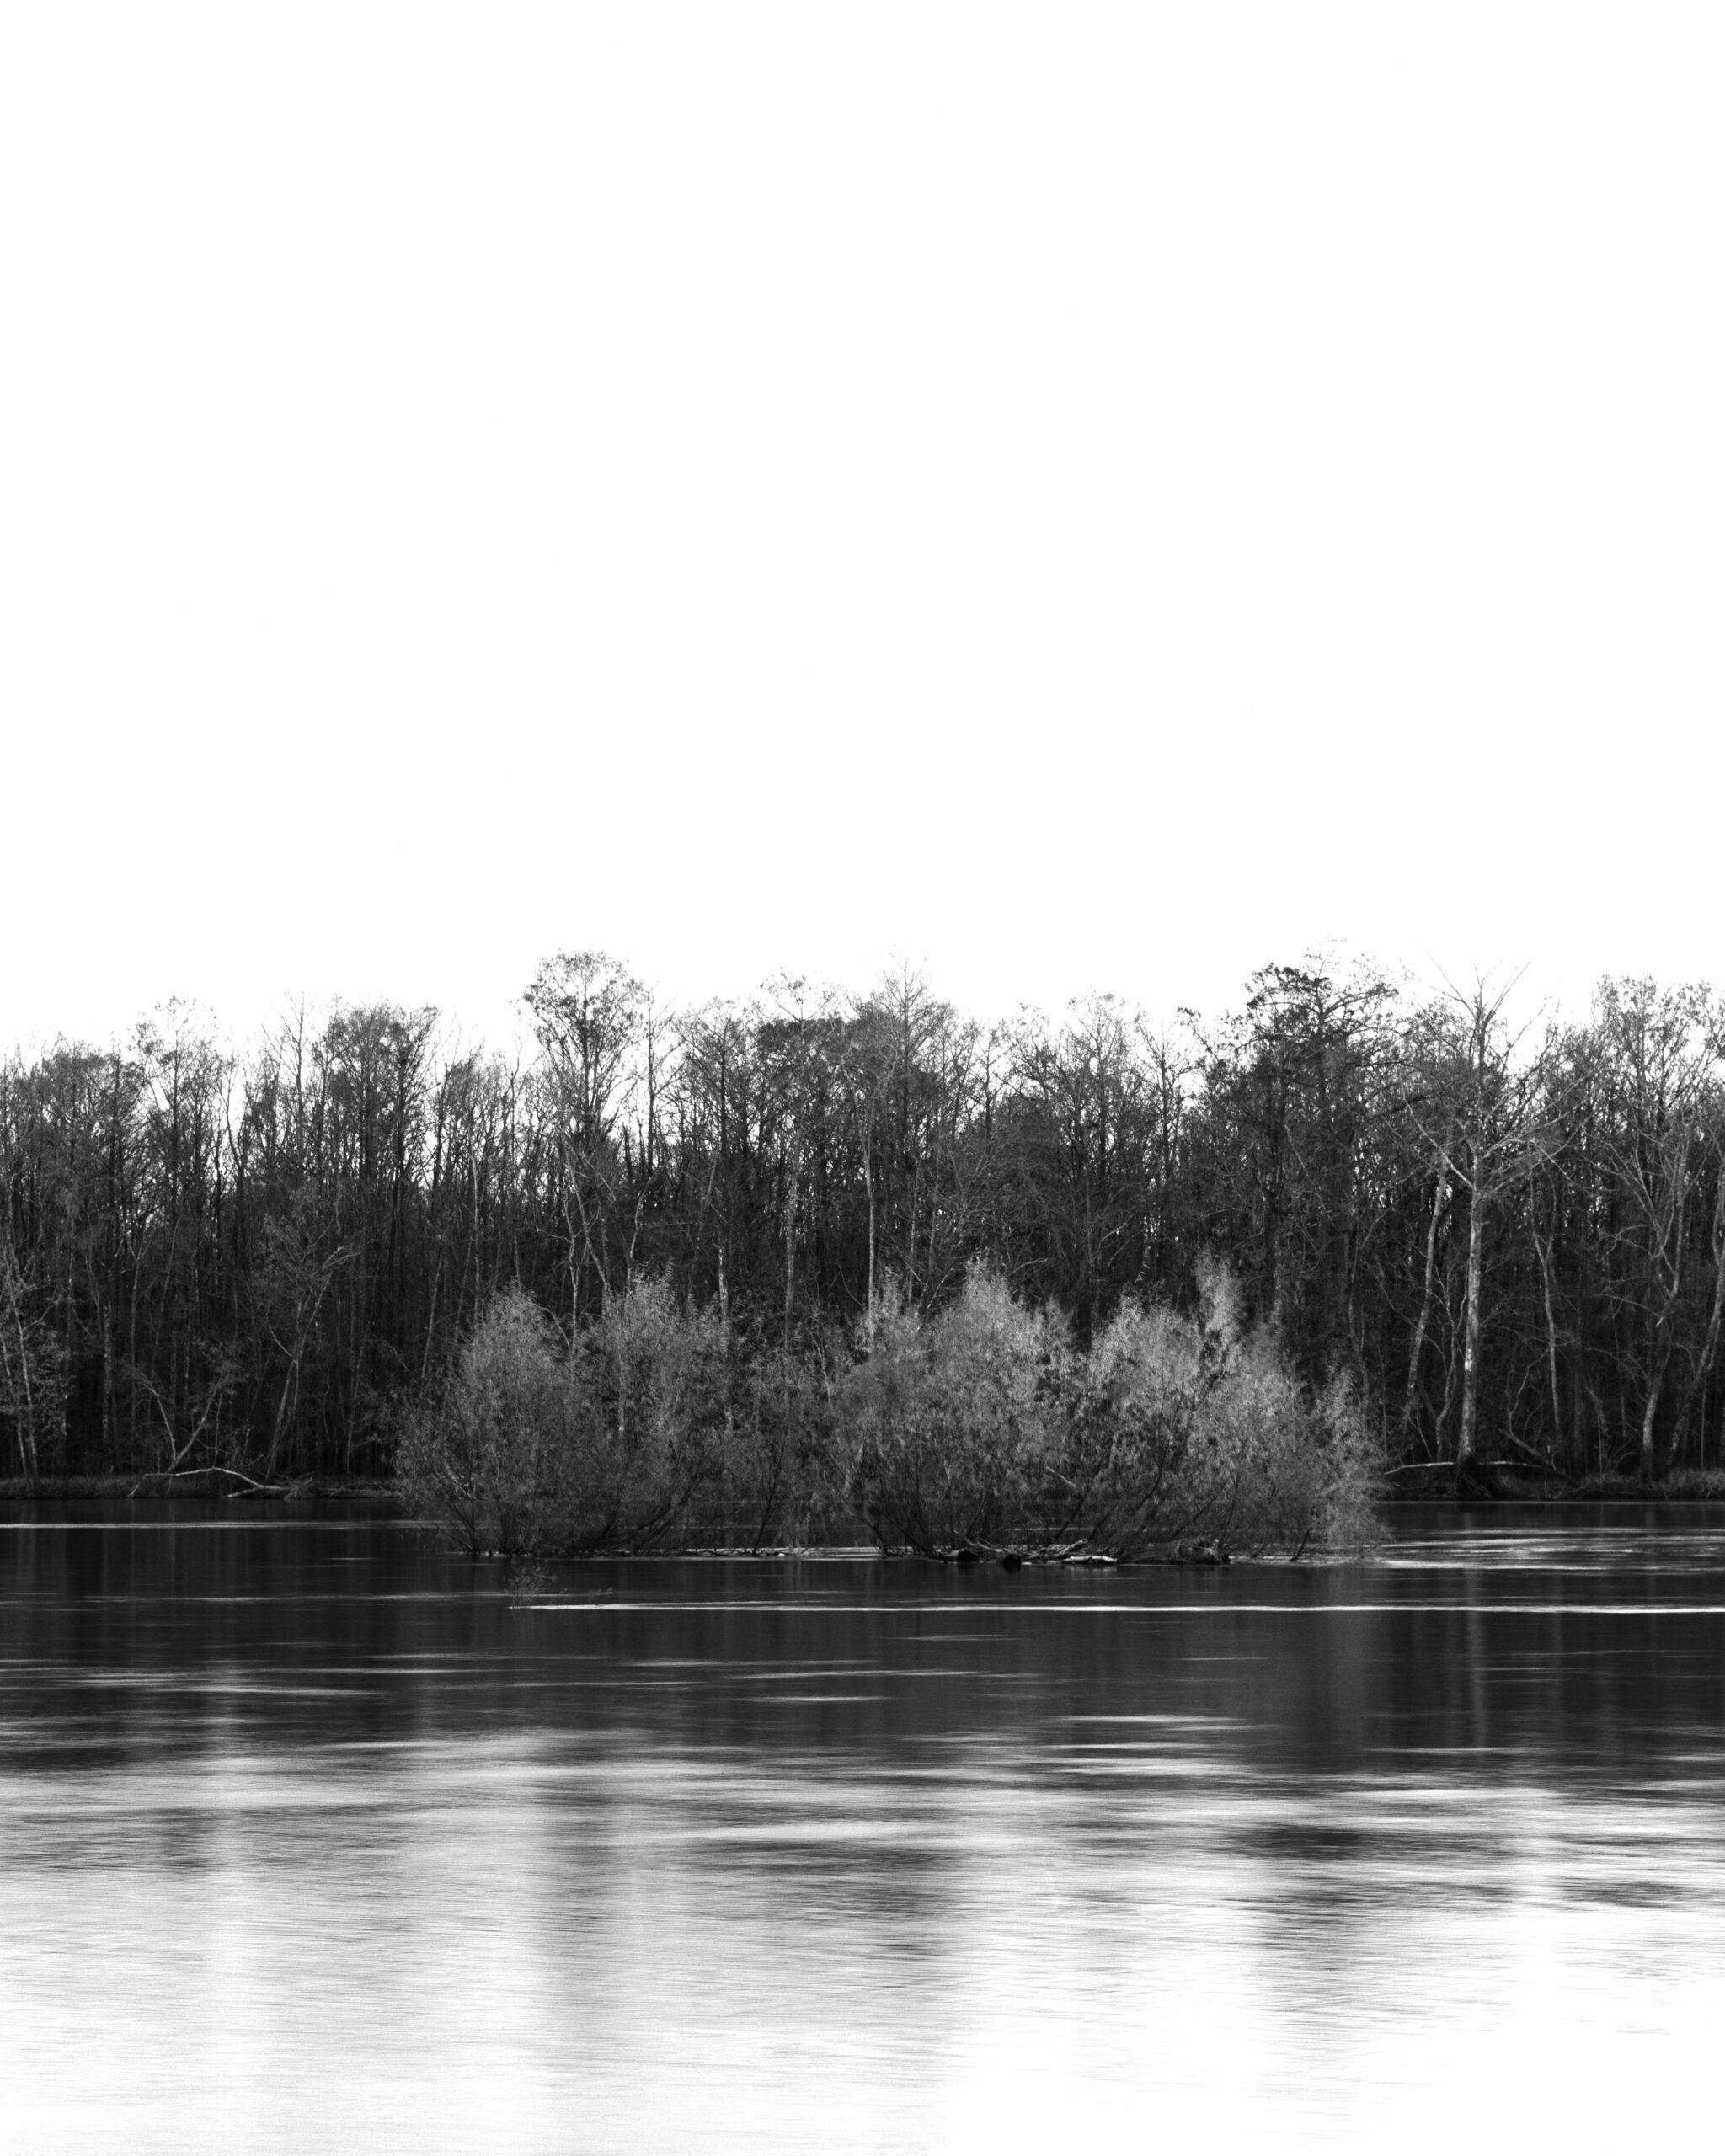 Apalachicola River 1, Florida. 2020